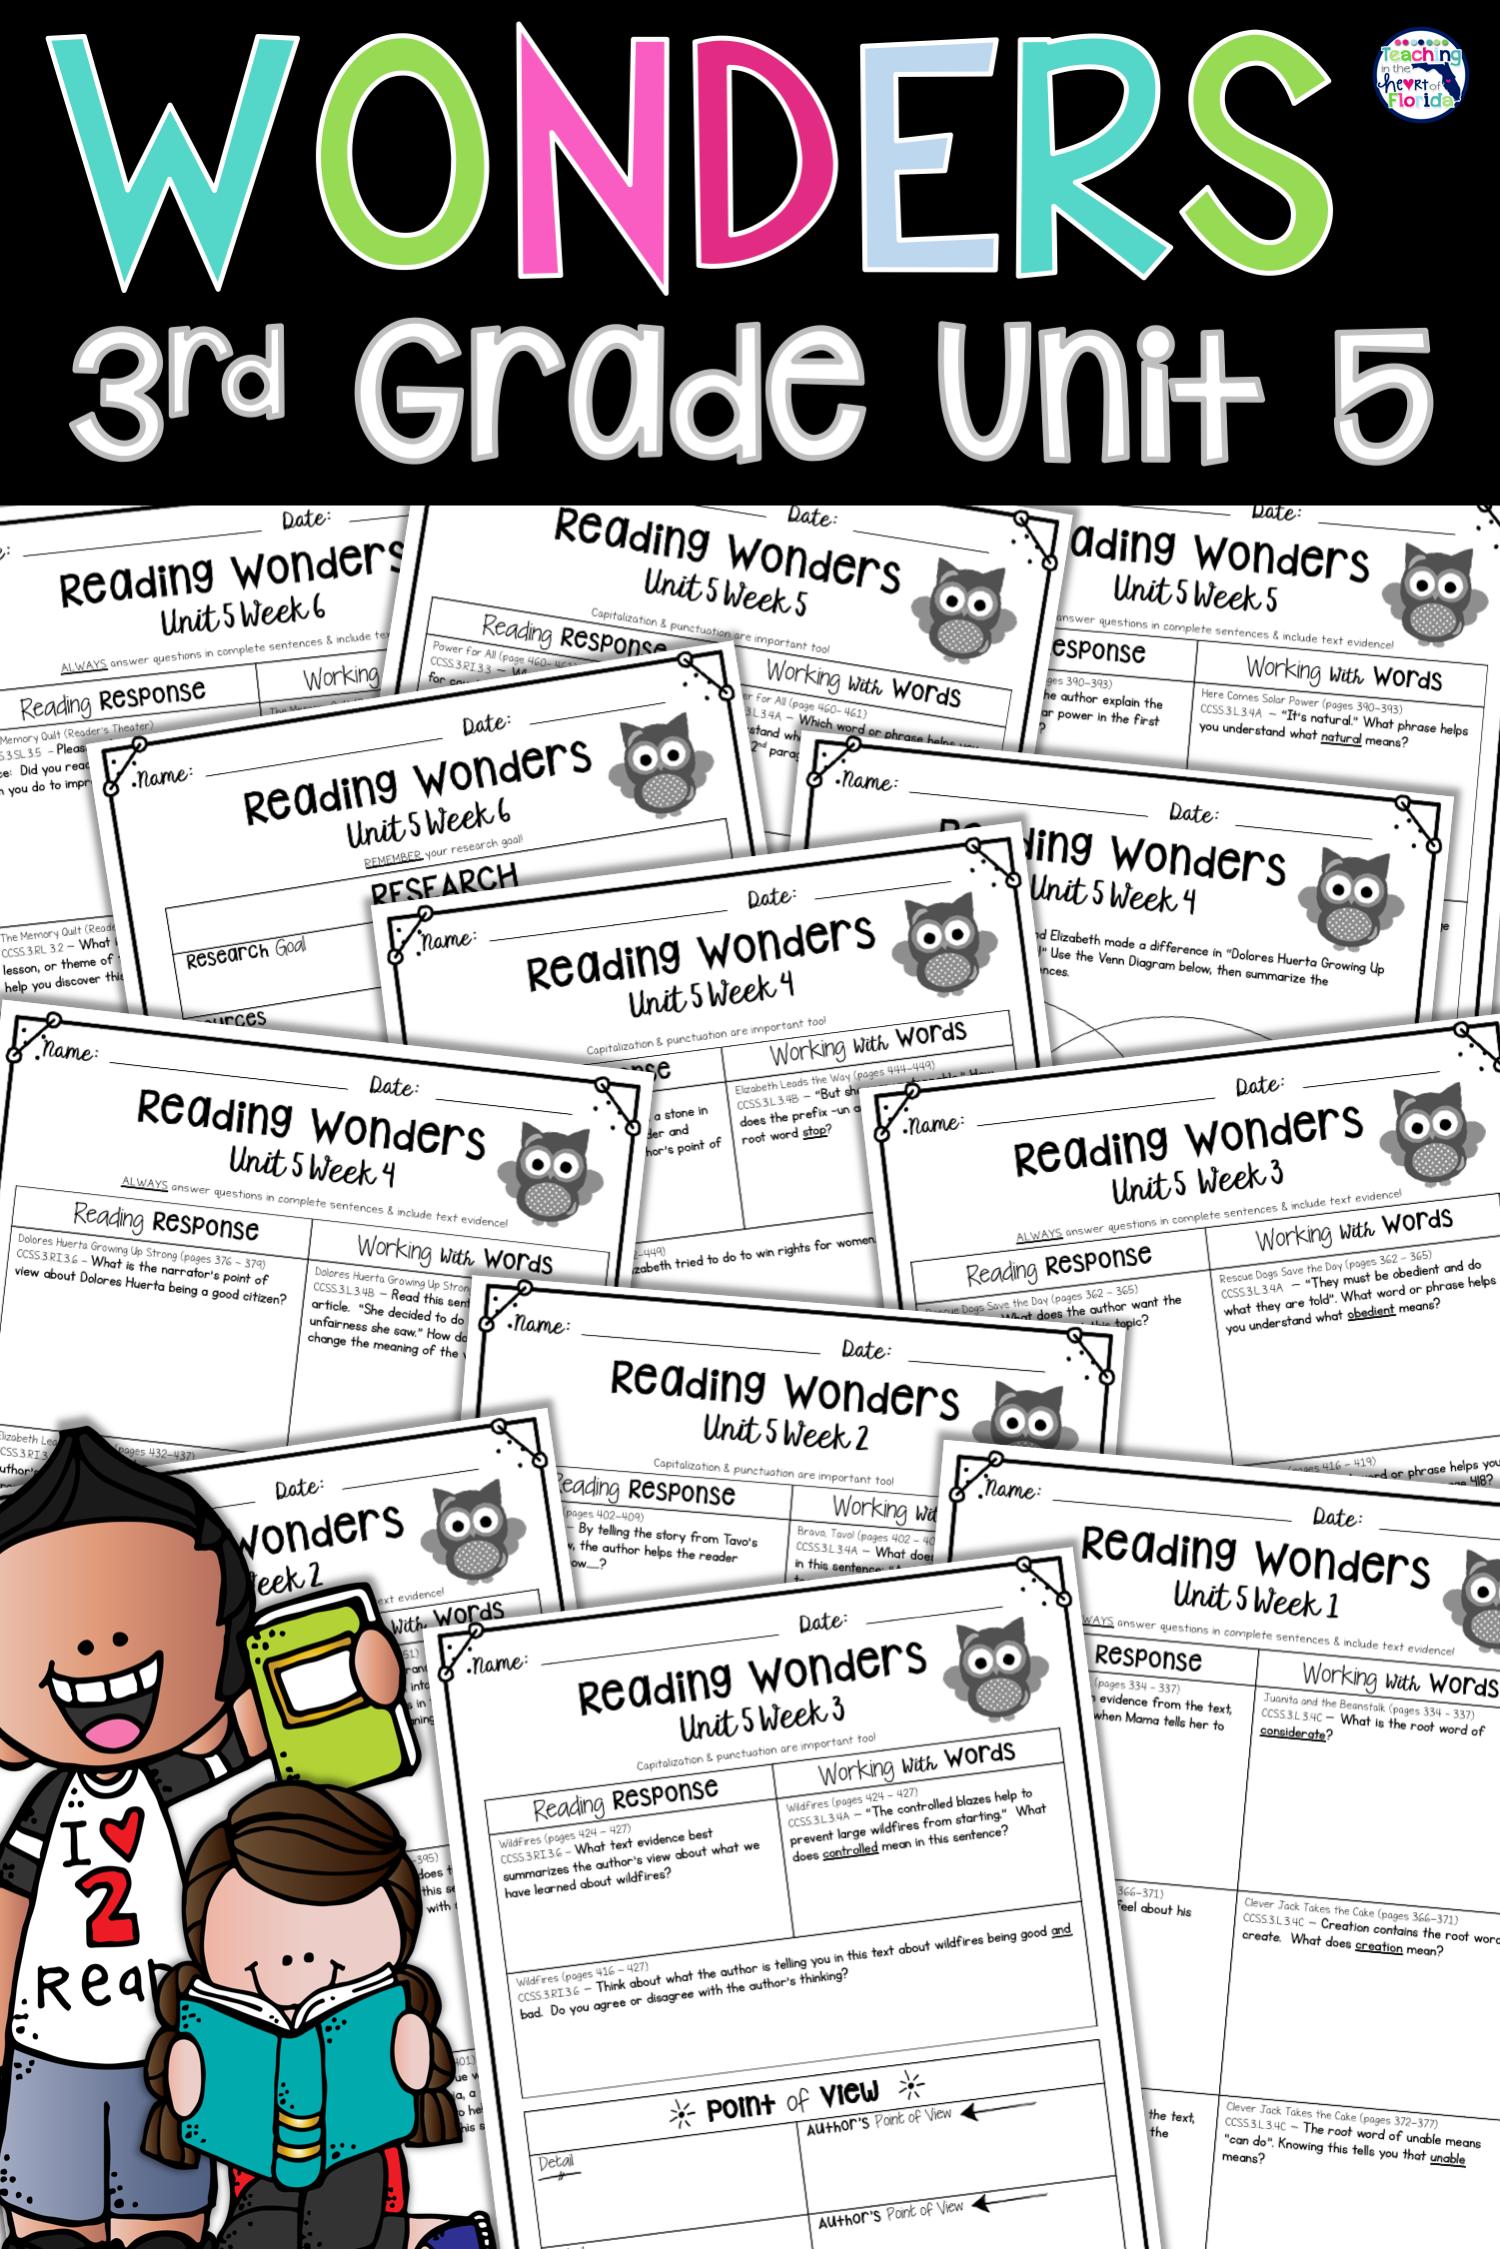 Wonders 3rd Grade Unit 5